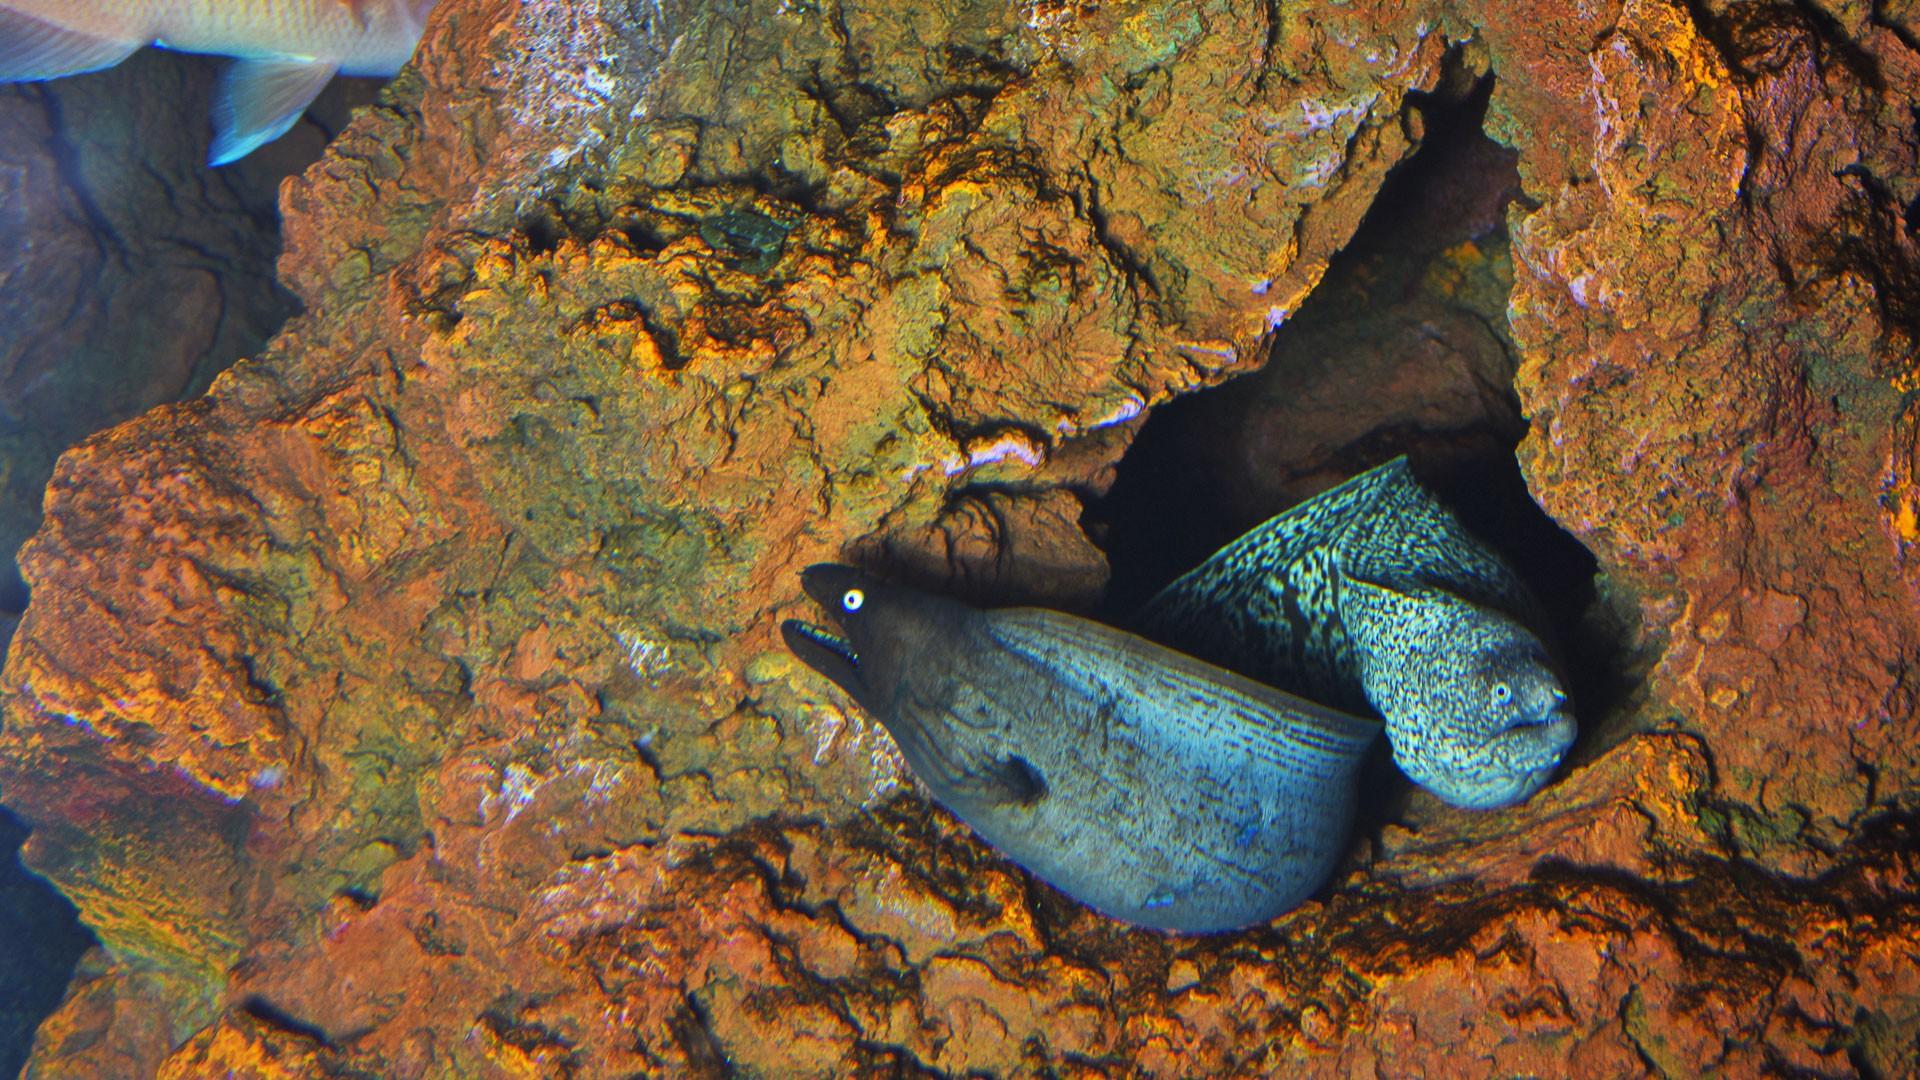 Black moray eel